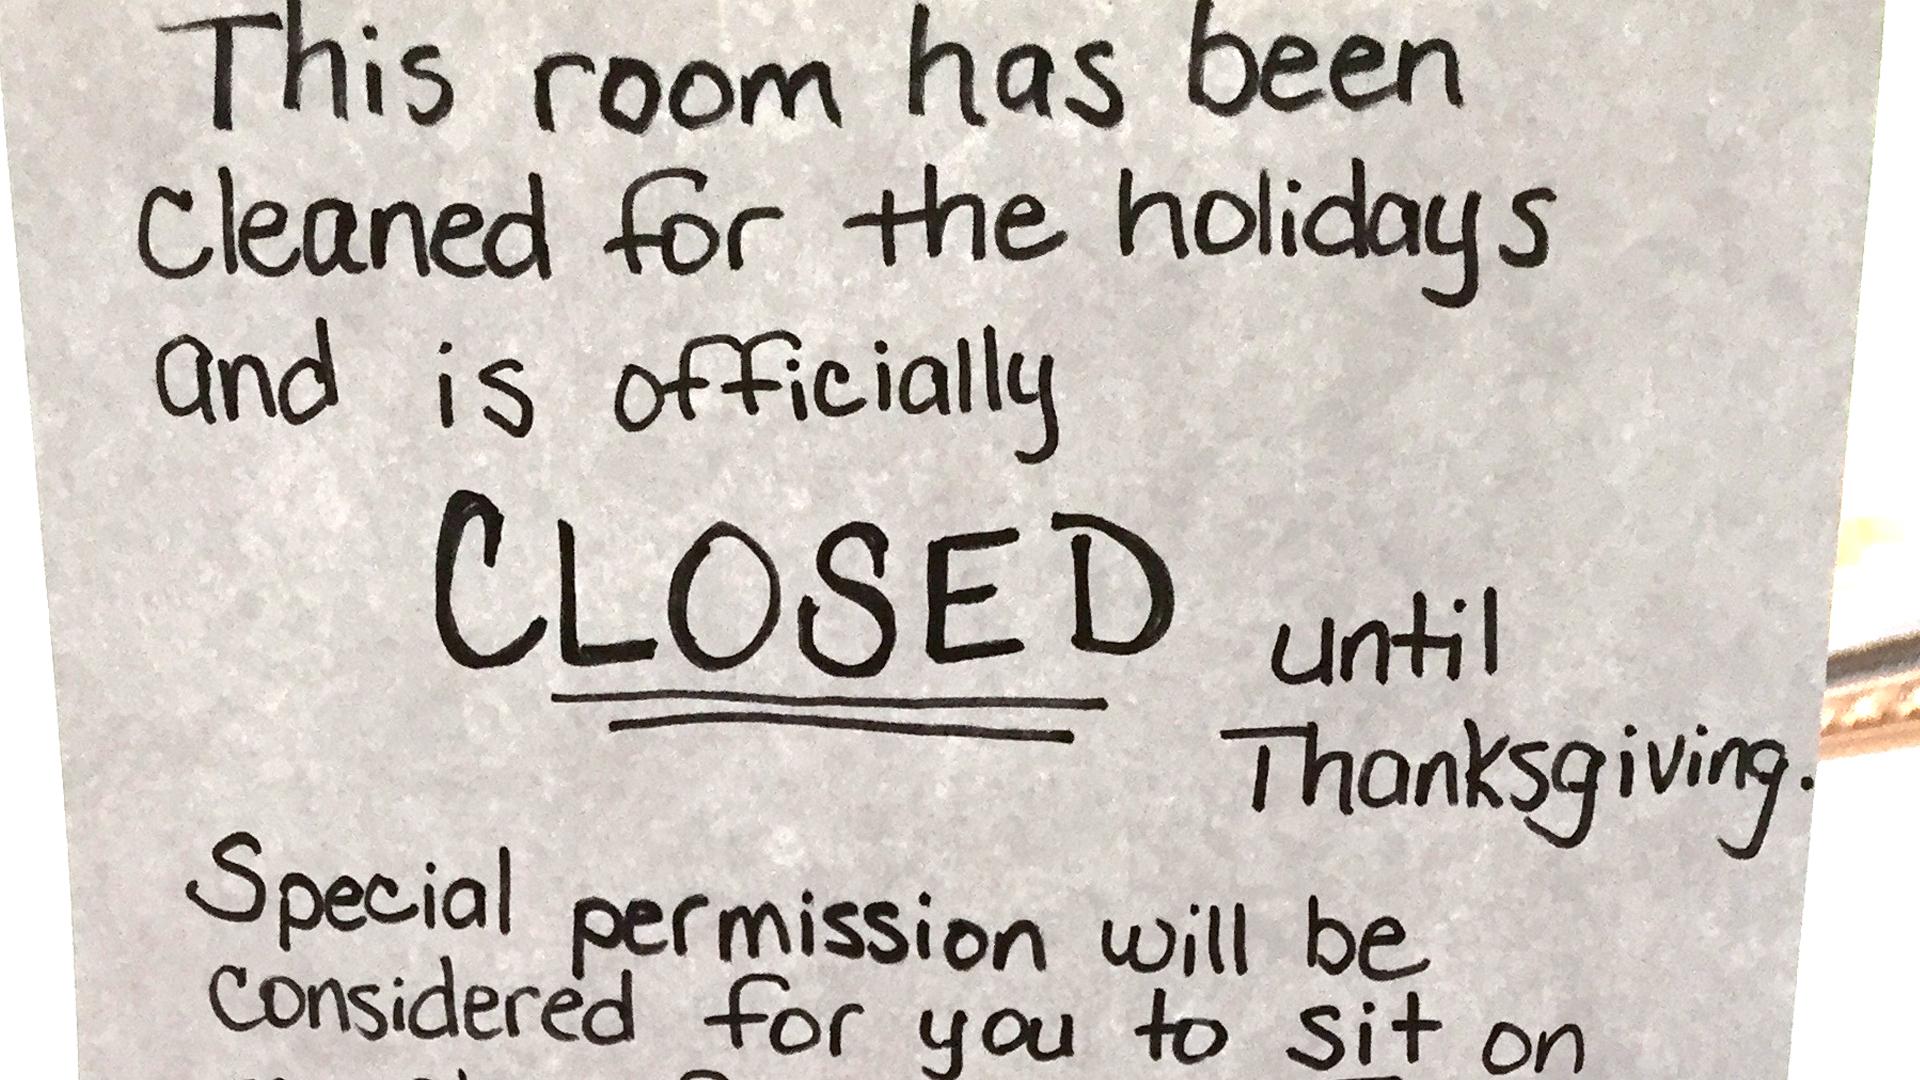 Mom Closes Living Room Until Thanksgiving